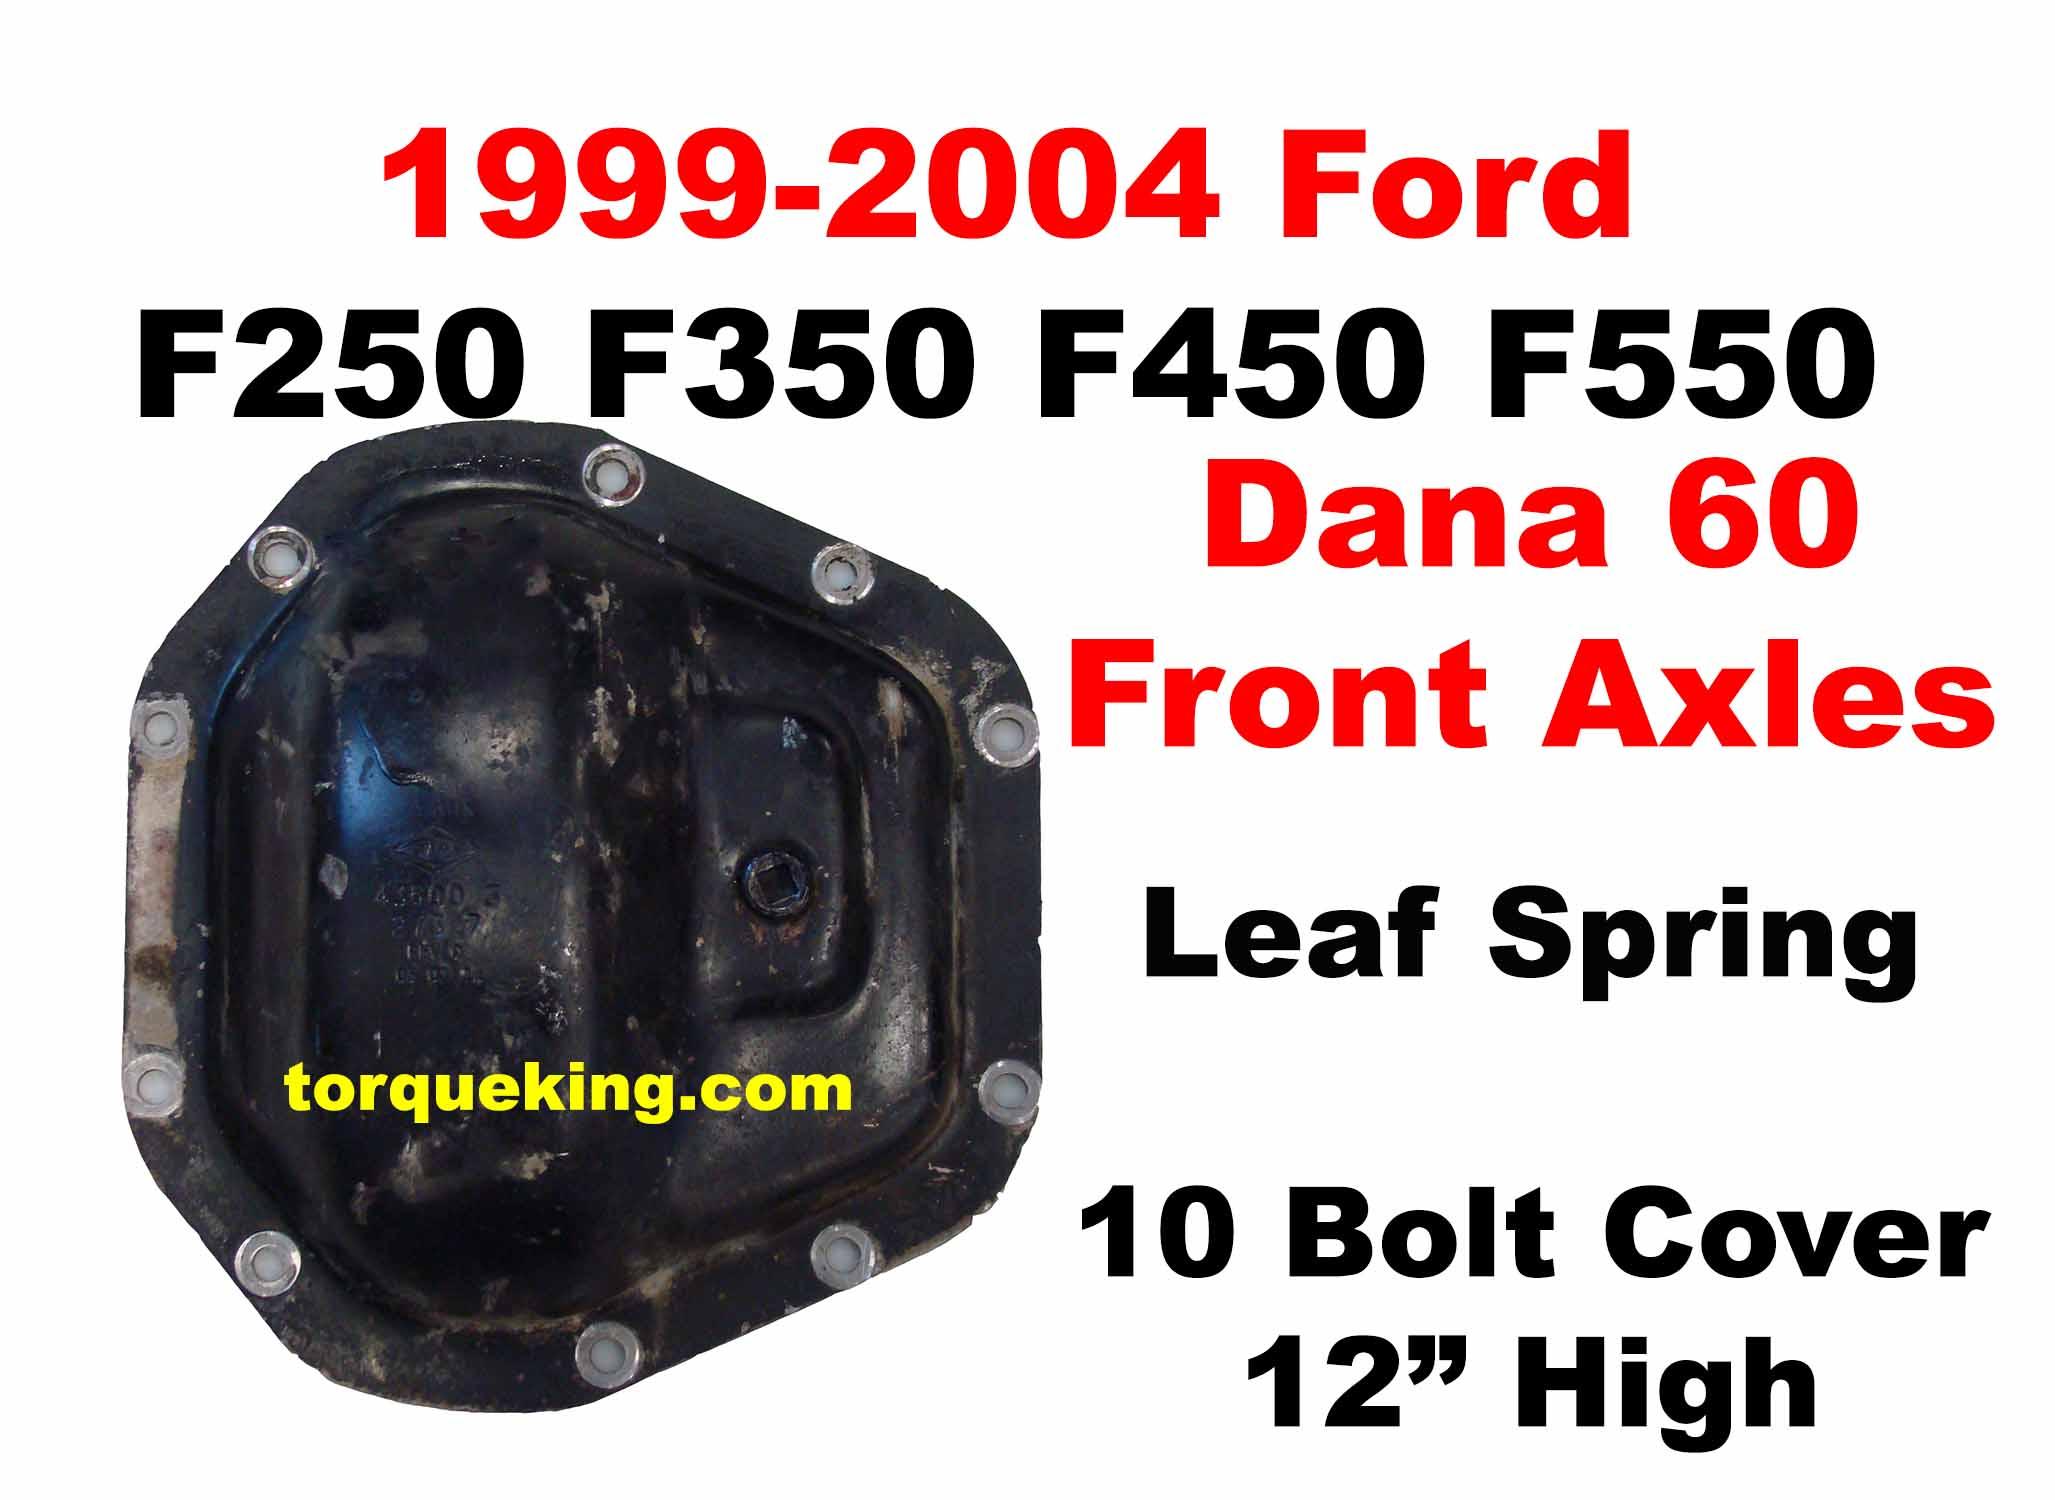 1999-2004-ford-dana60-front-axle-cover-lq